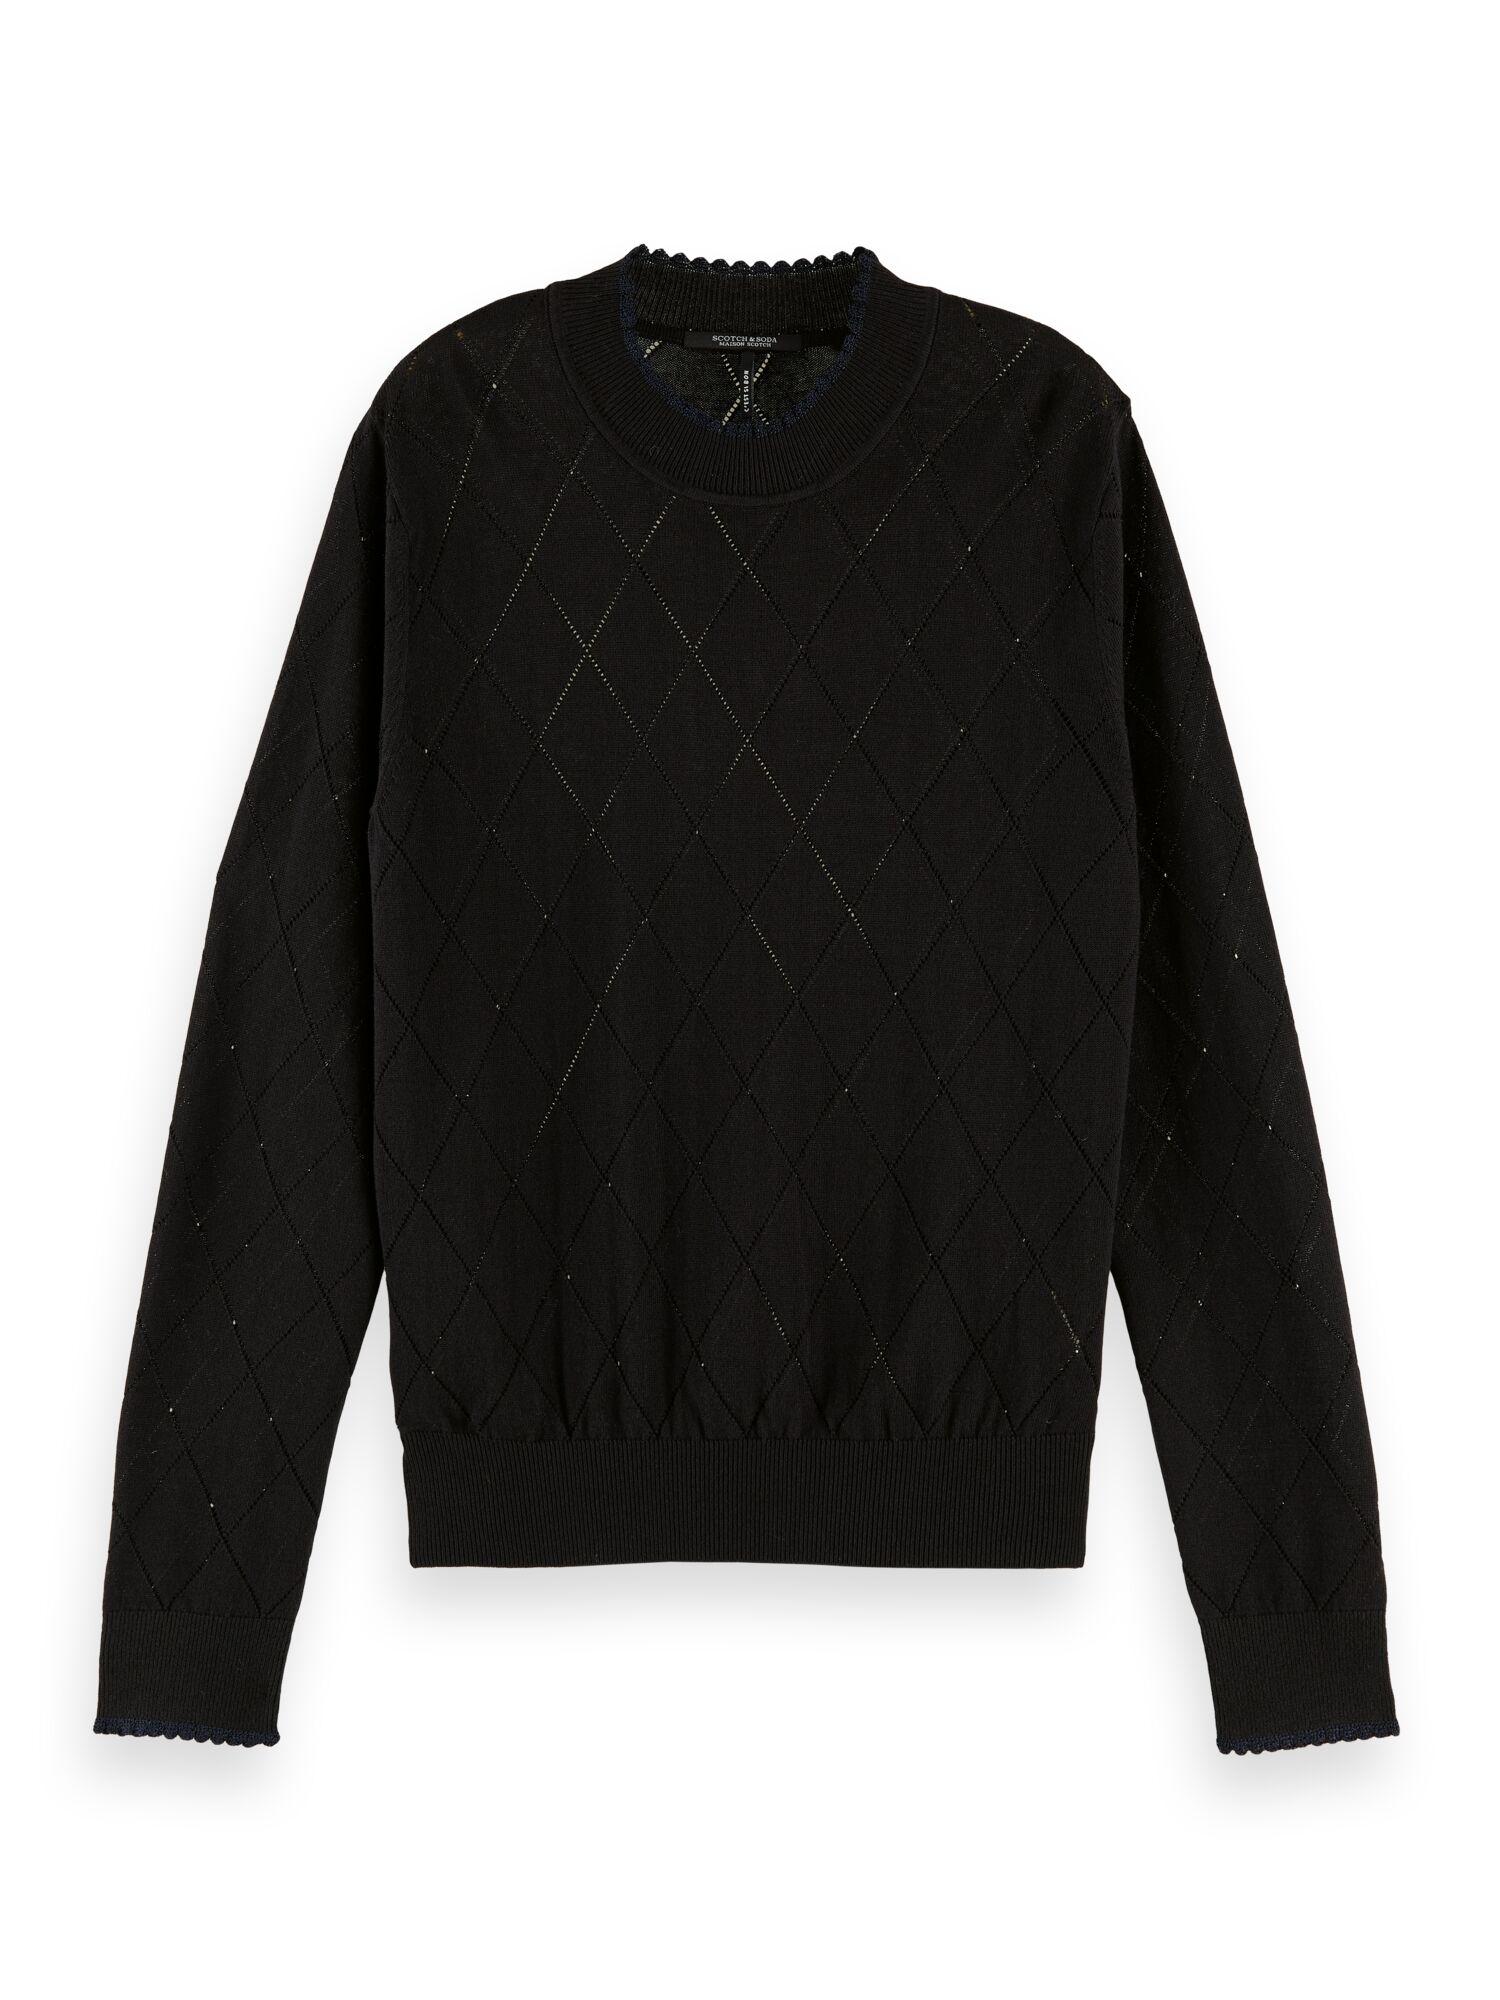 Scotch & Soda | Pointelle stitch knit in organic cotton viscose blend